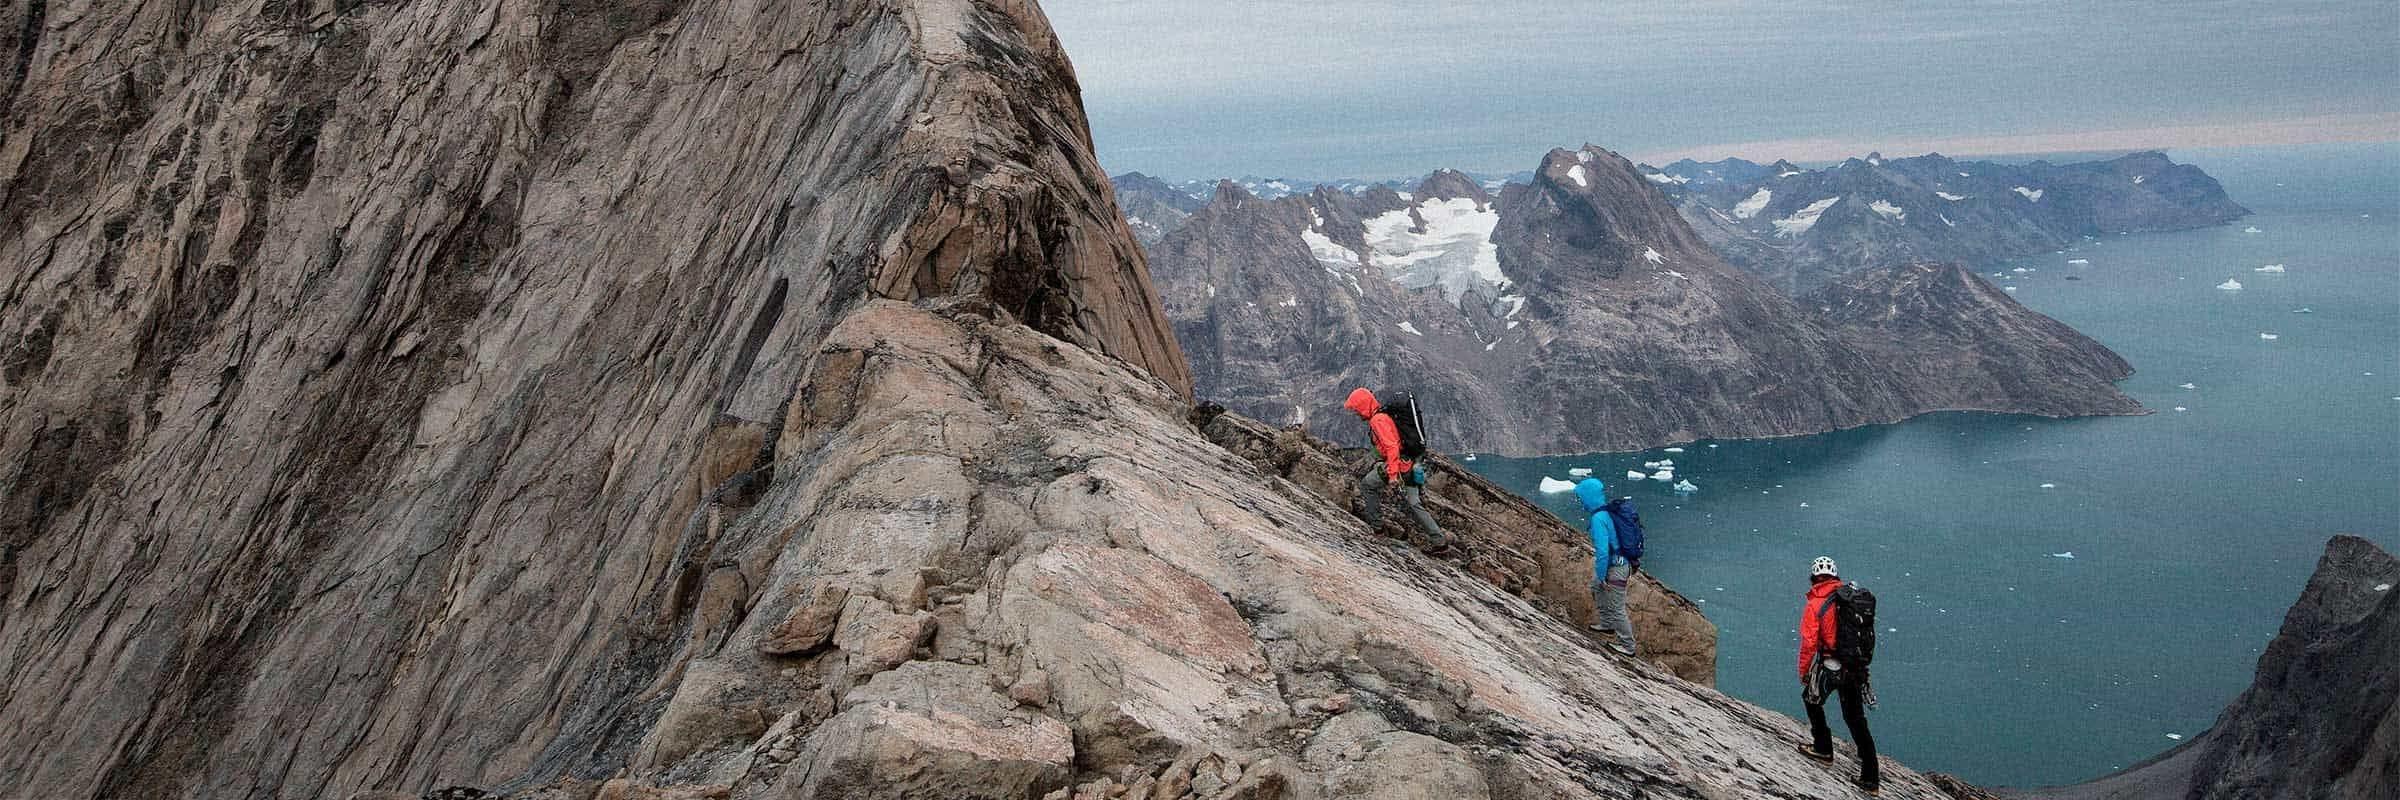 Arc'teryx, Hiking & Trekking, Ski & Snowboard. Understanding the Arc'teryx Apparel Naming Scheme